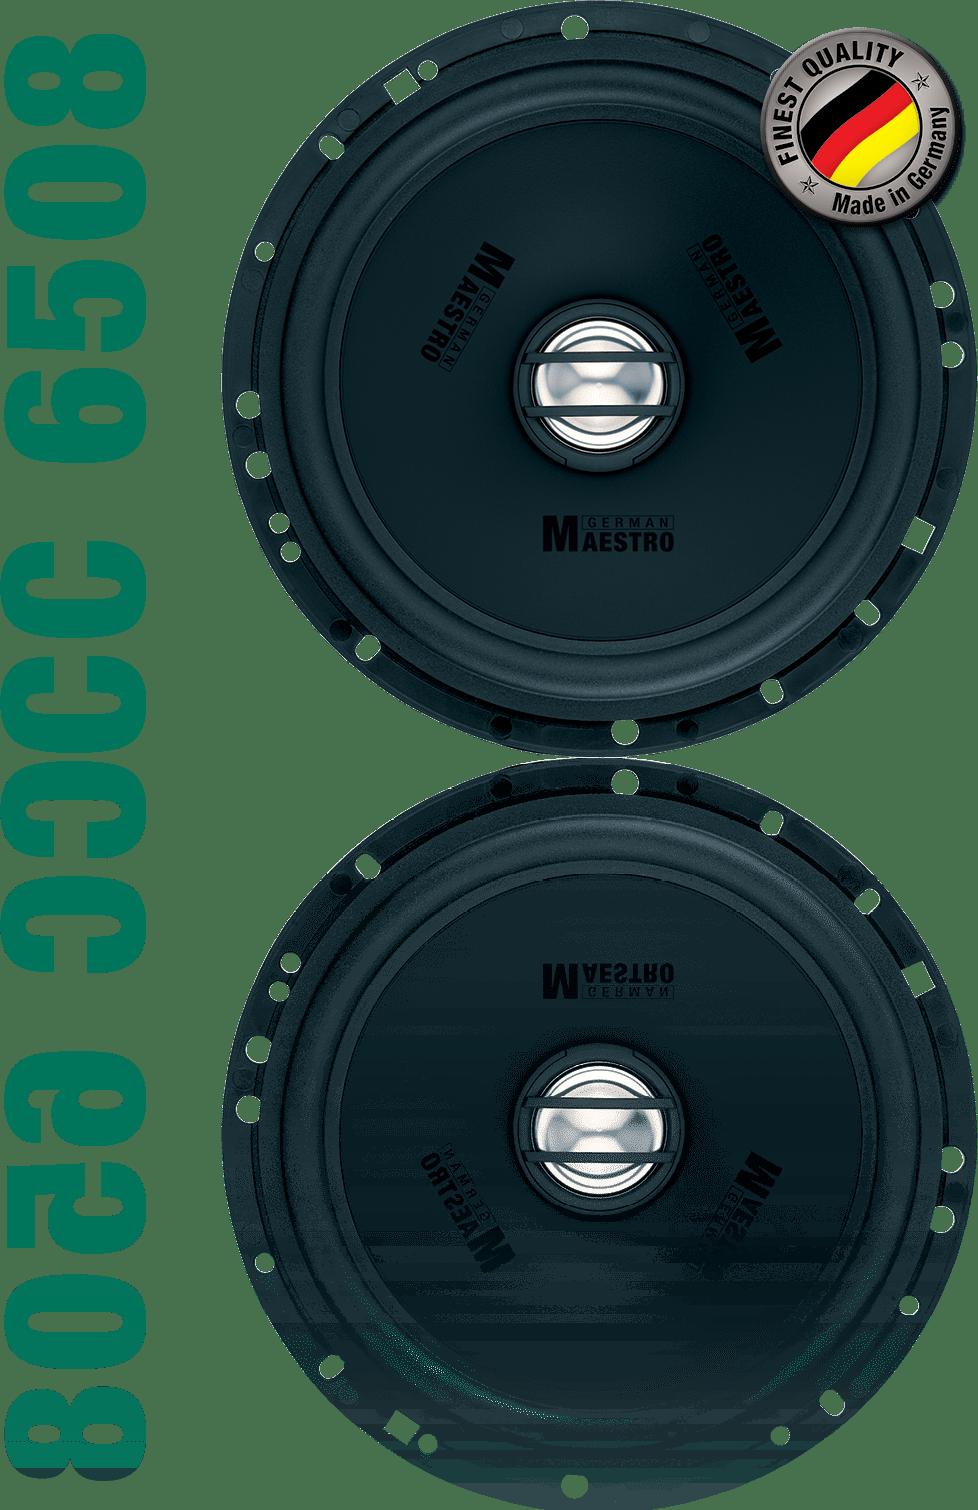 German Maestro Concept Line CC 6508